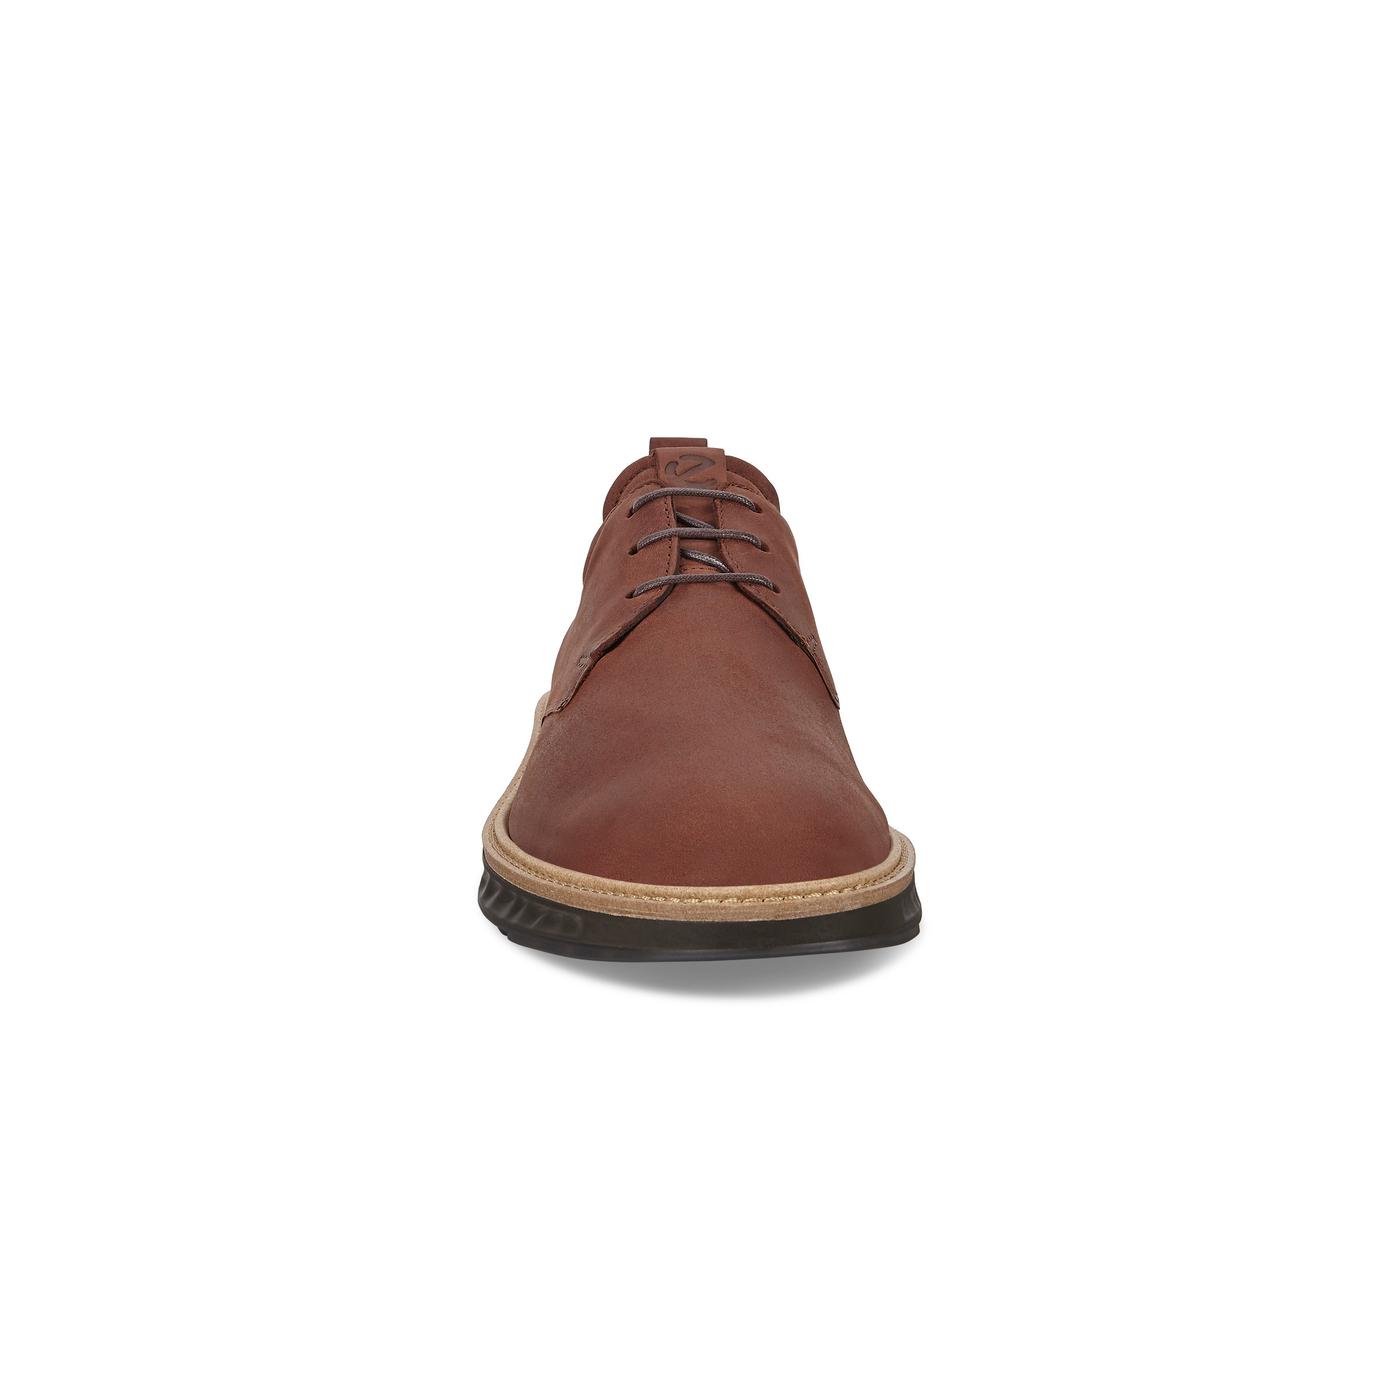 ECCO ST.1 HYBRID Plain Toe Tie